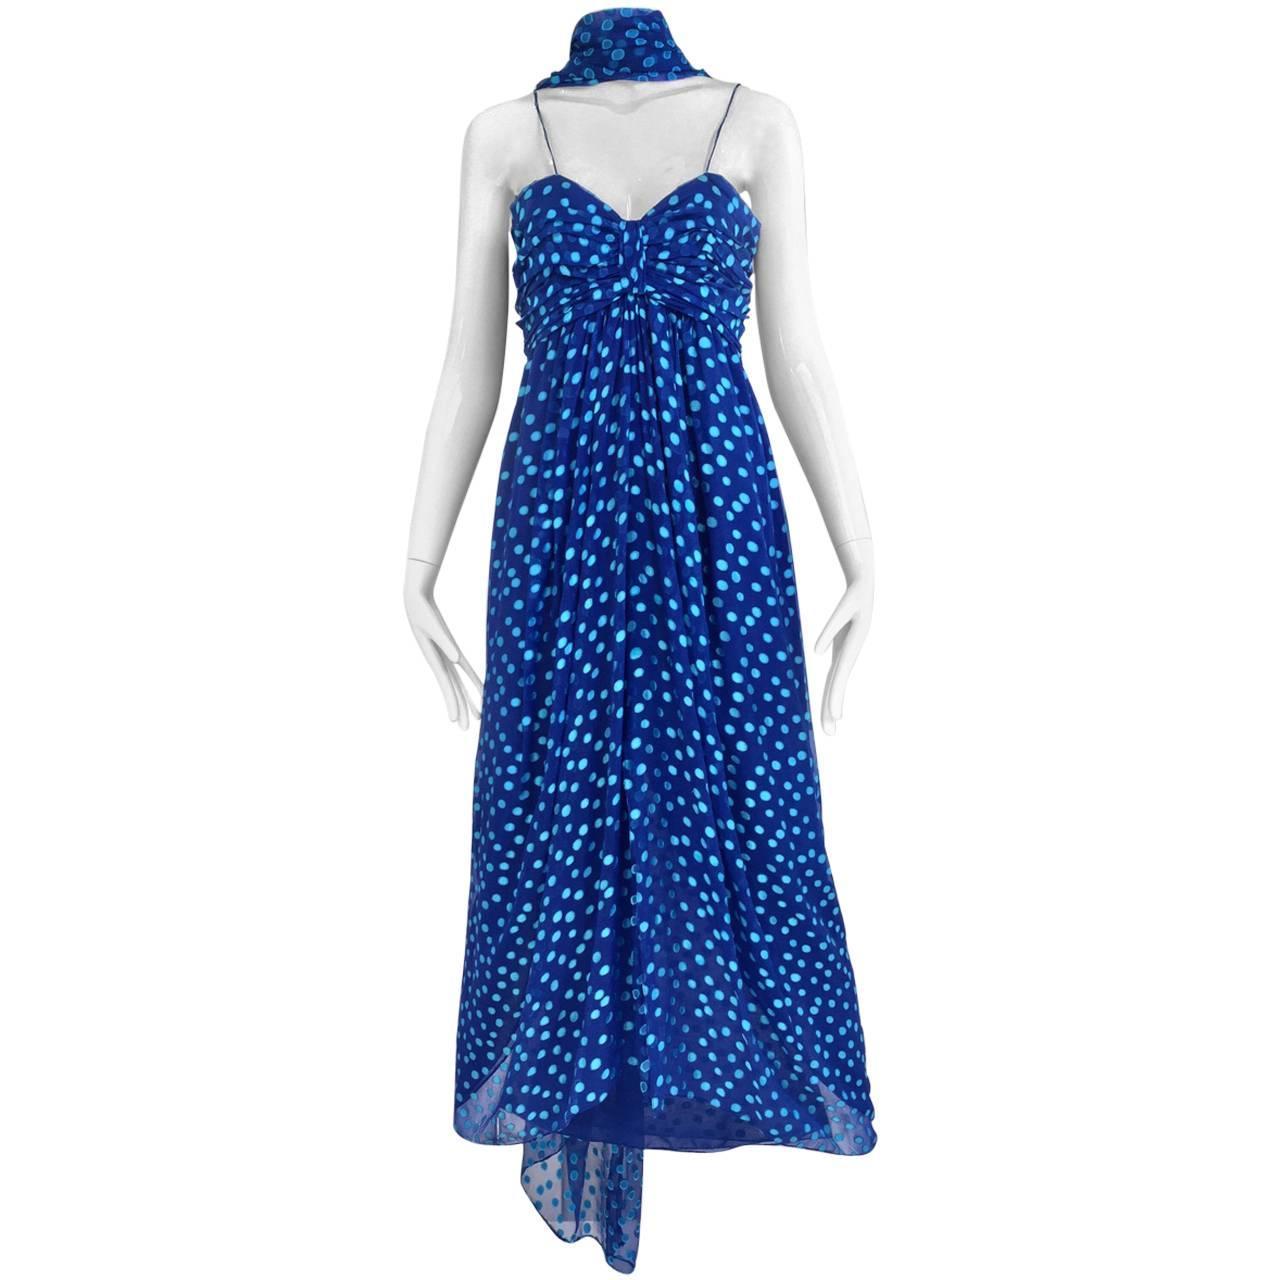 1970s Oscar De La Renta Blue Silk Polkadot Dress with Shawl